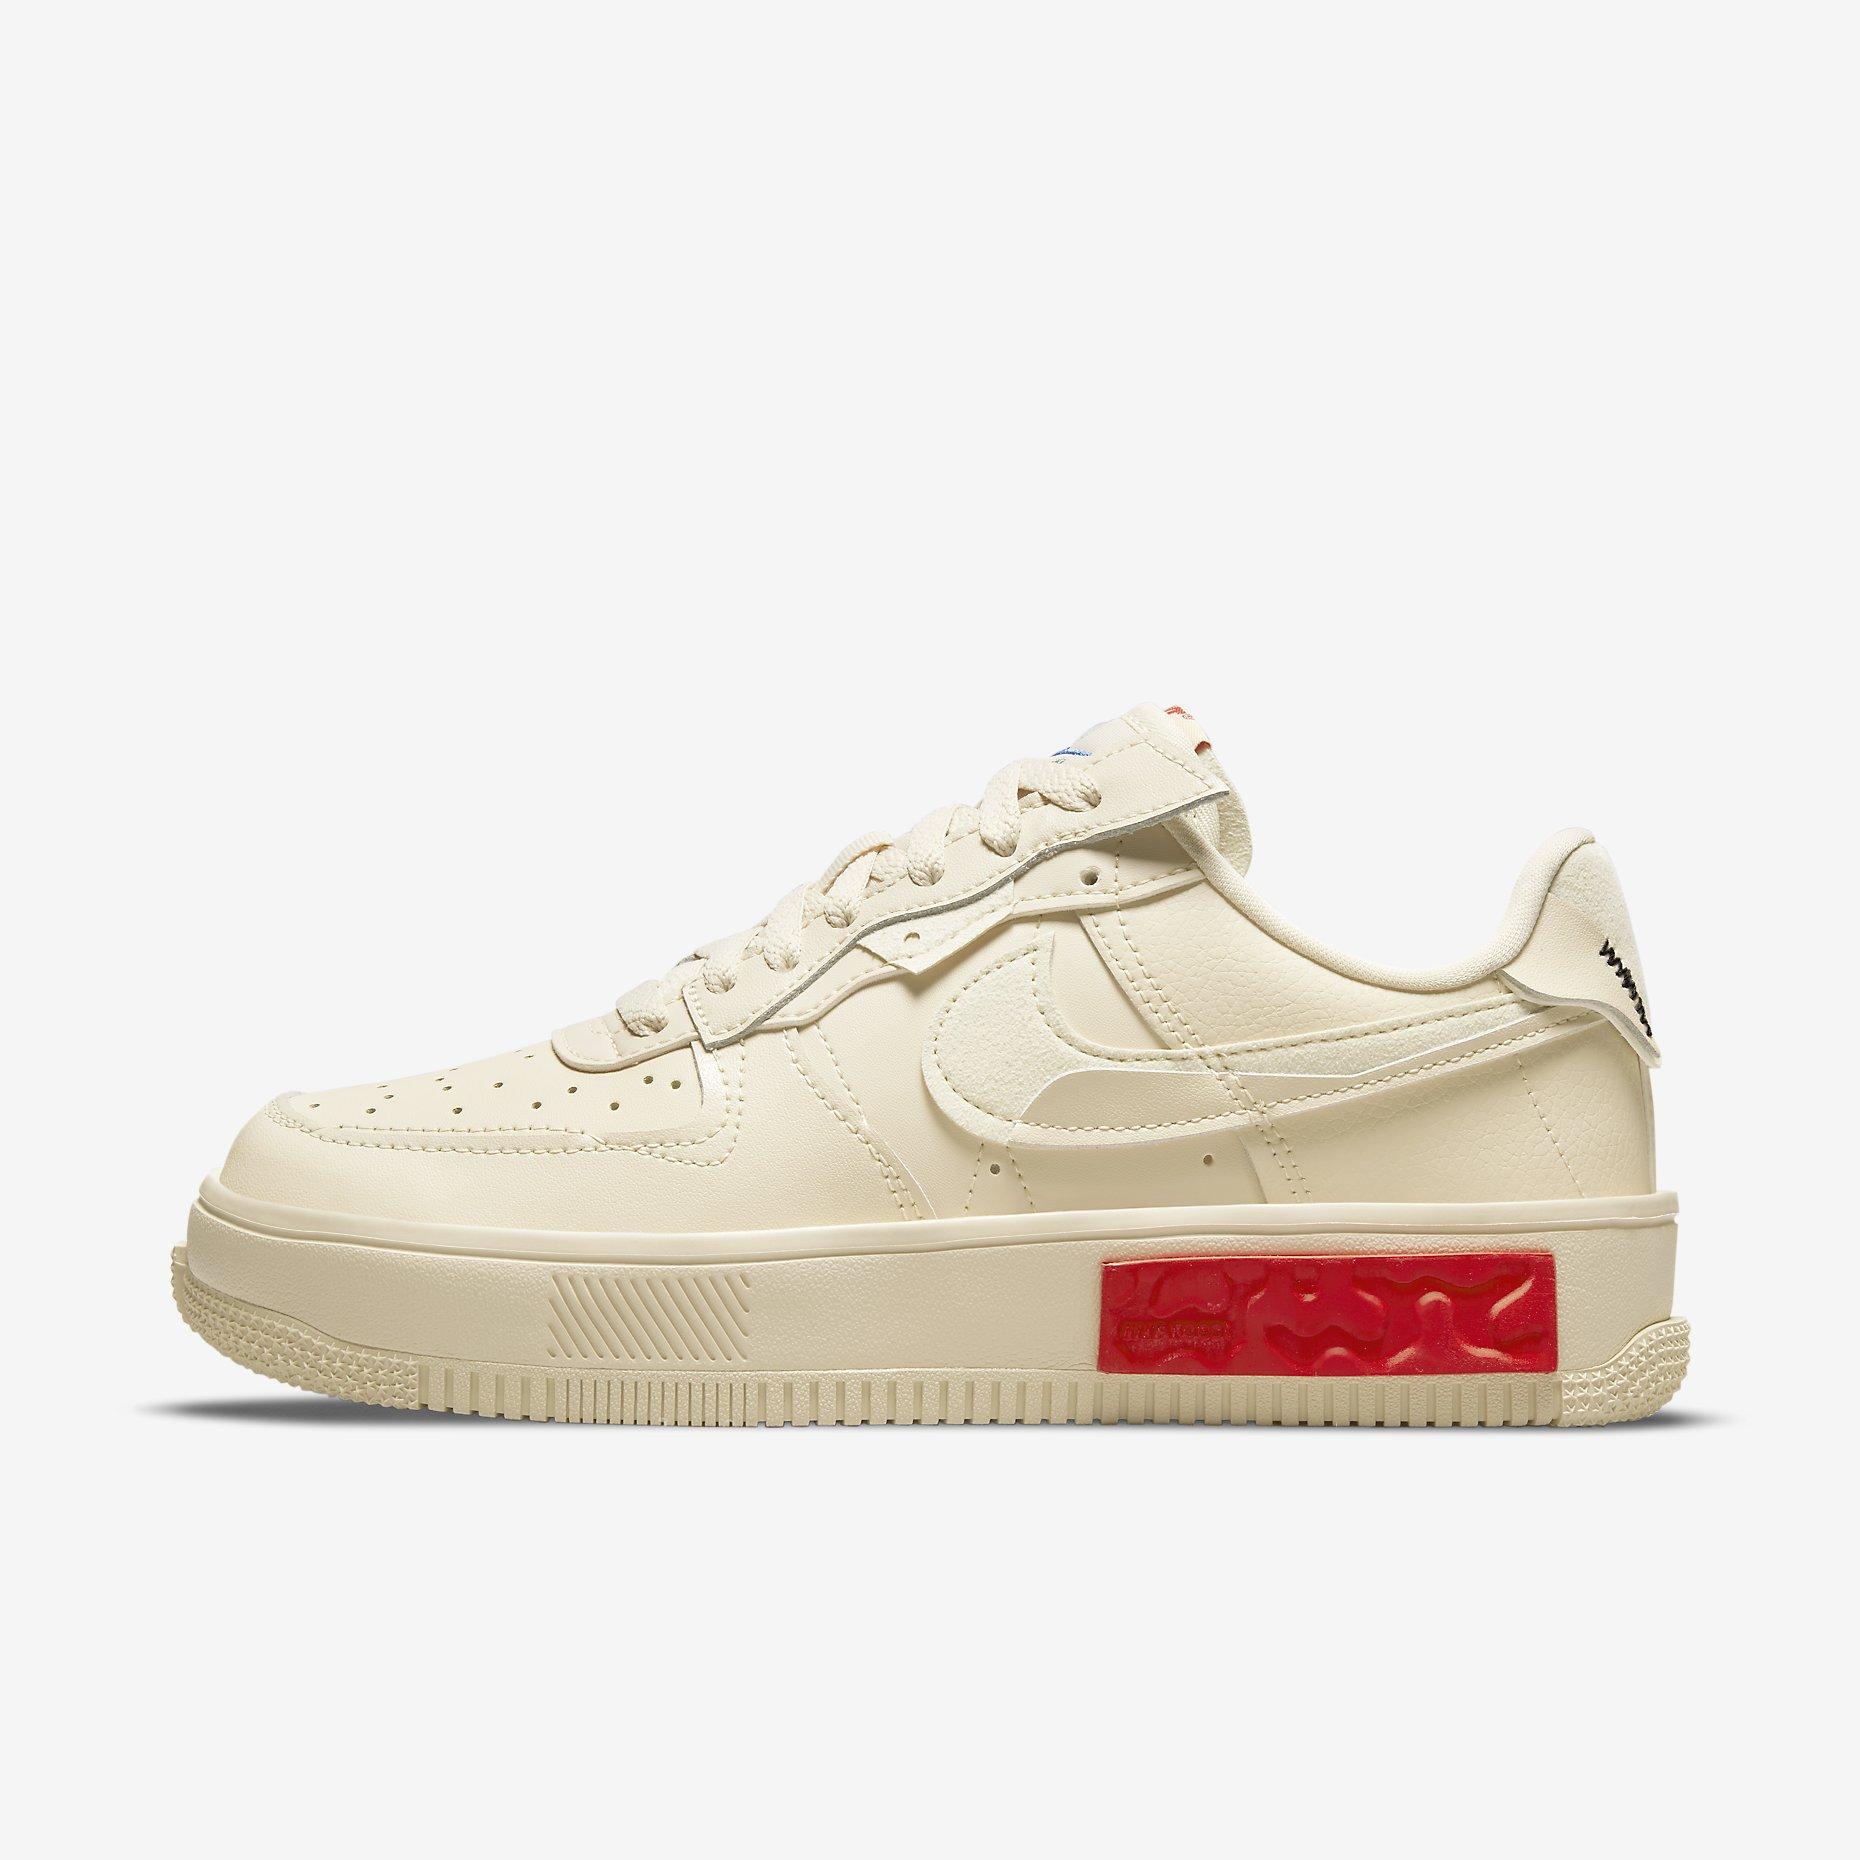 Women's Nike Air Force 1 Fontanka 'Pearl White'